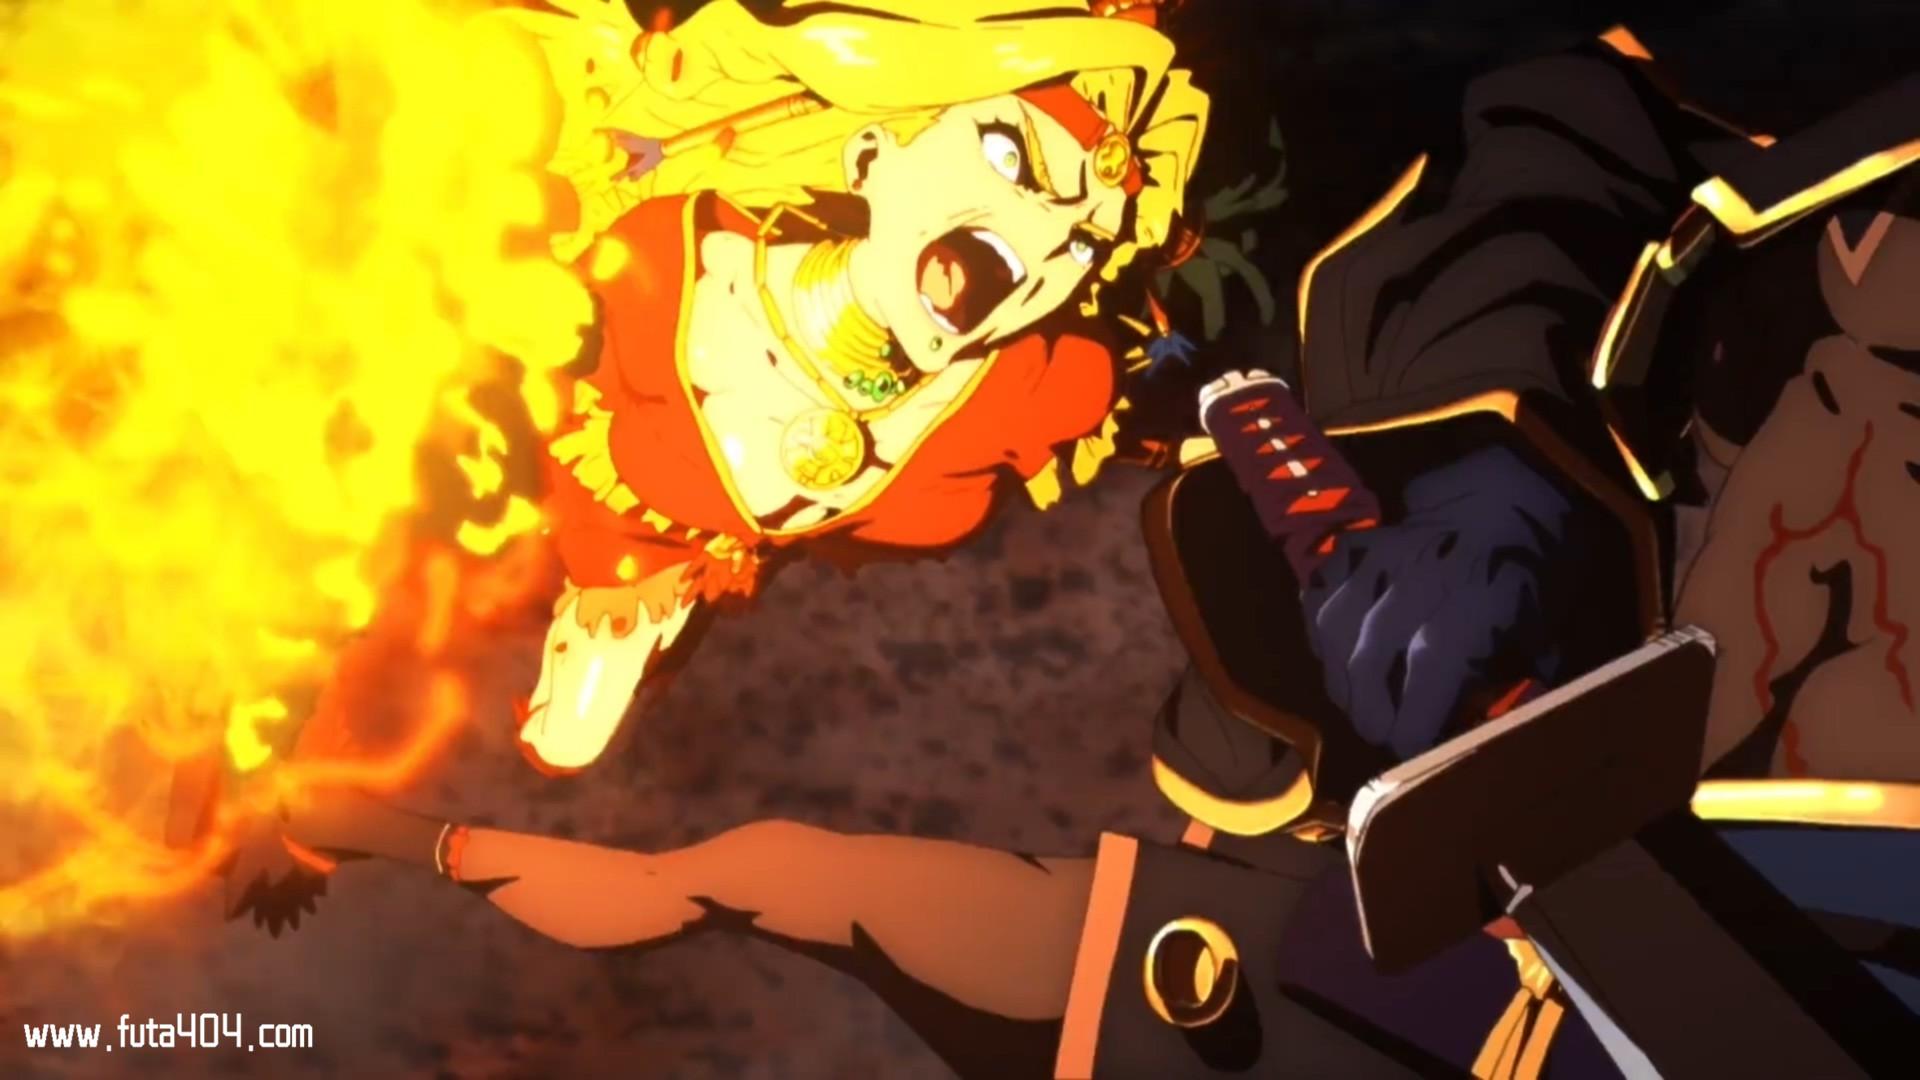 Fate Grand Order 绝对魔兽战线巴比伦尼亚 第18话 Fate Grand Order 动画在线 第1张